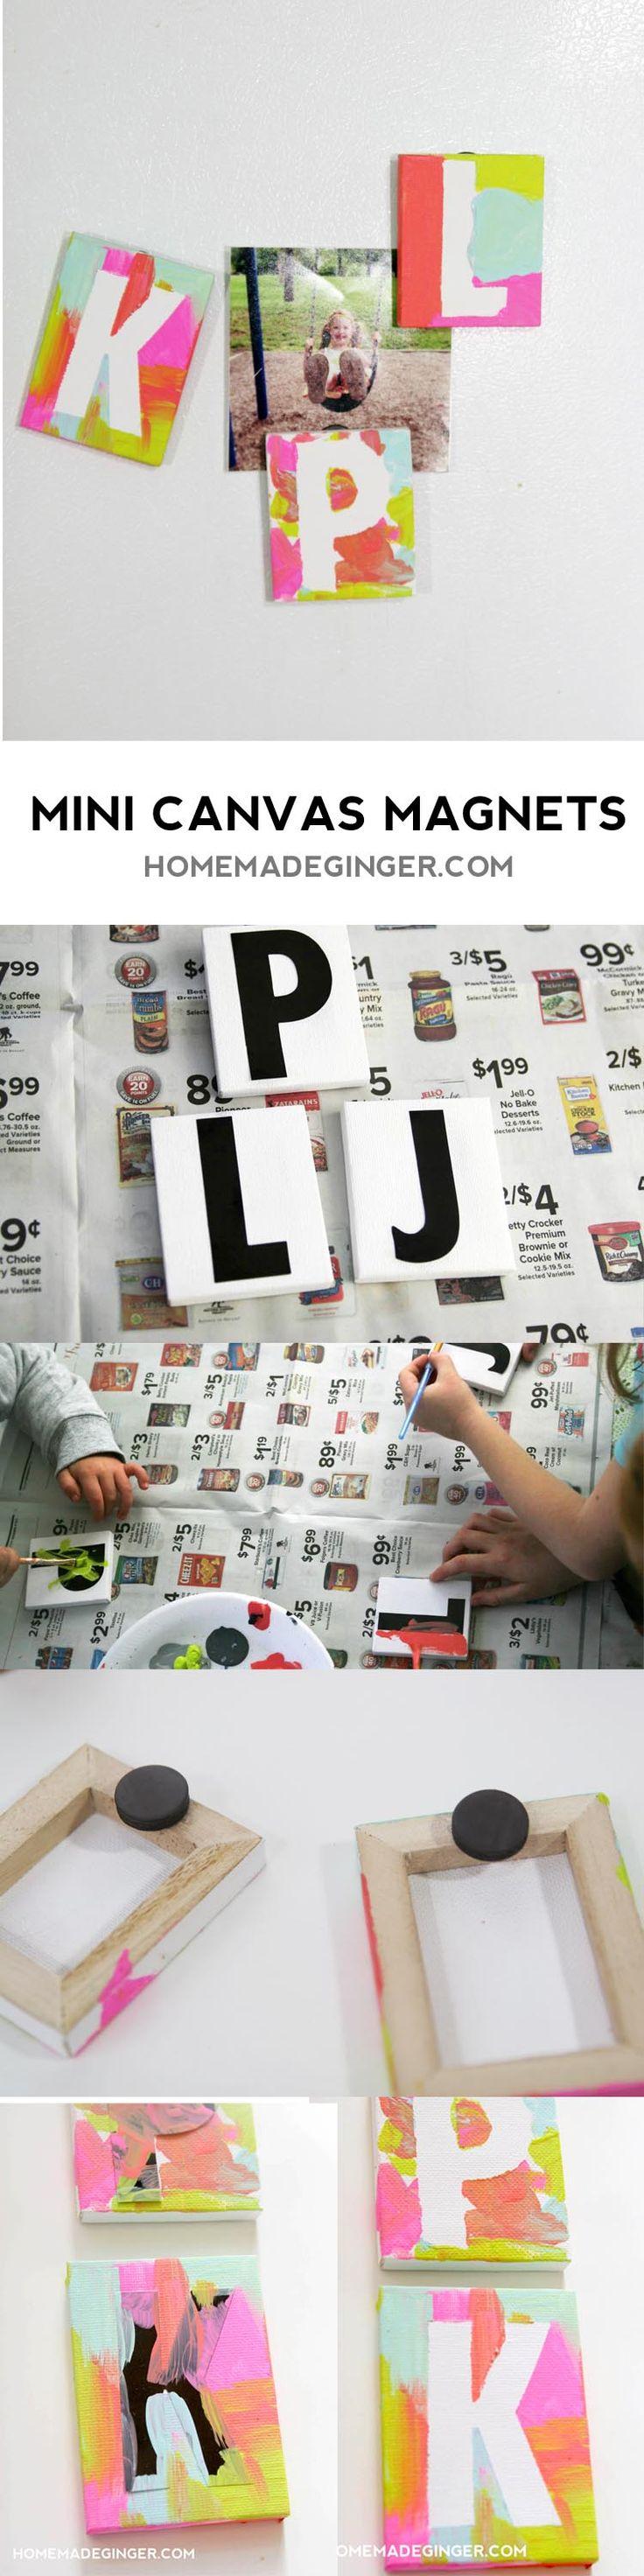 Best 25+ Kid friendly canvas art ideas on Pinterest | Kids canvas art,  Button canvas art and Flower canvas art